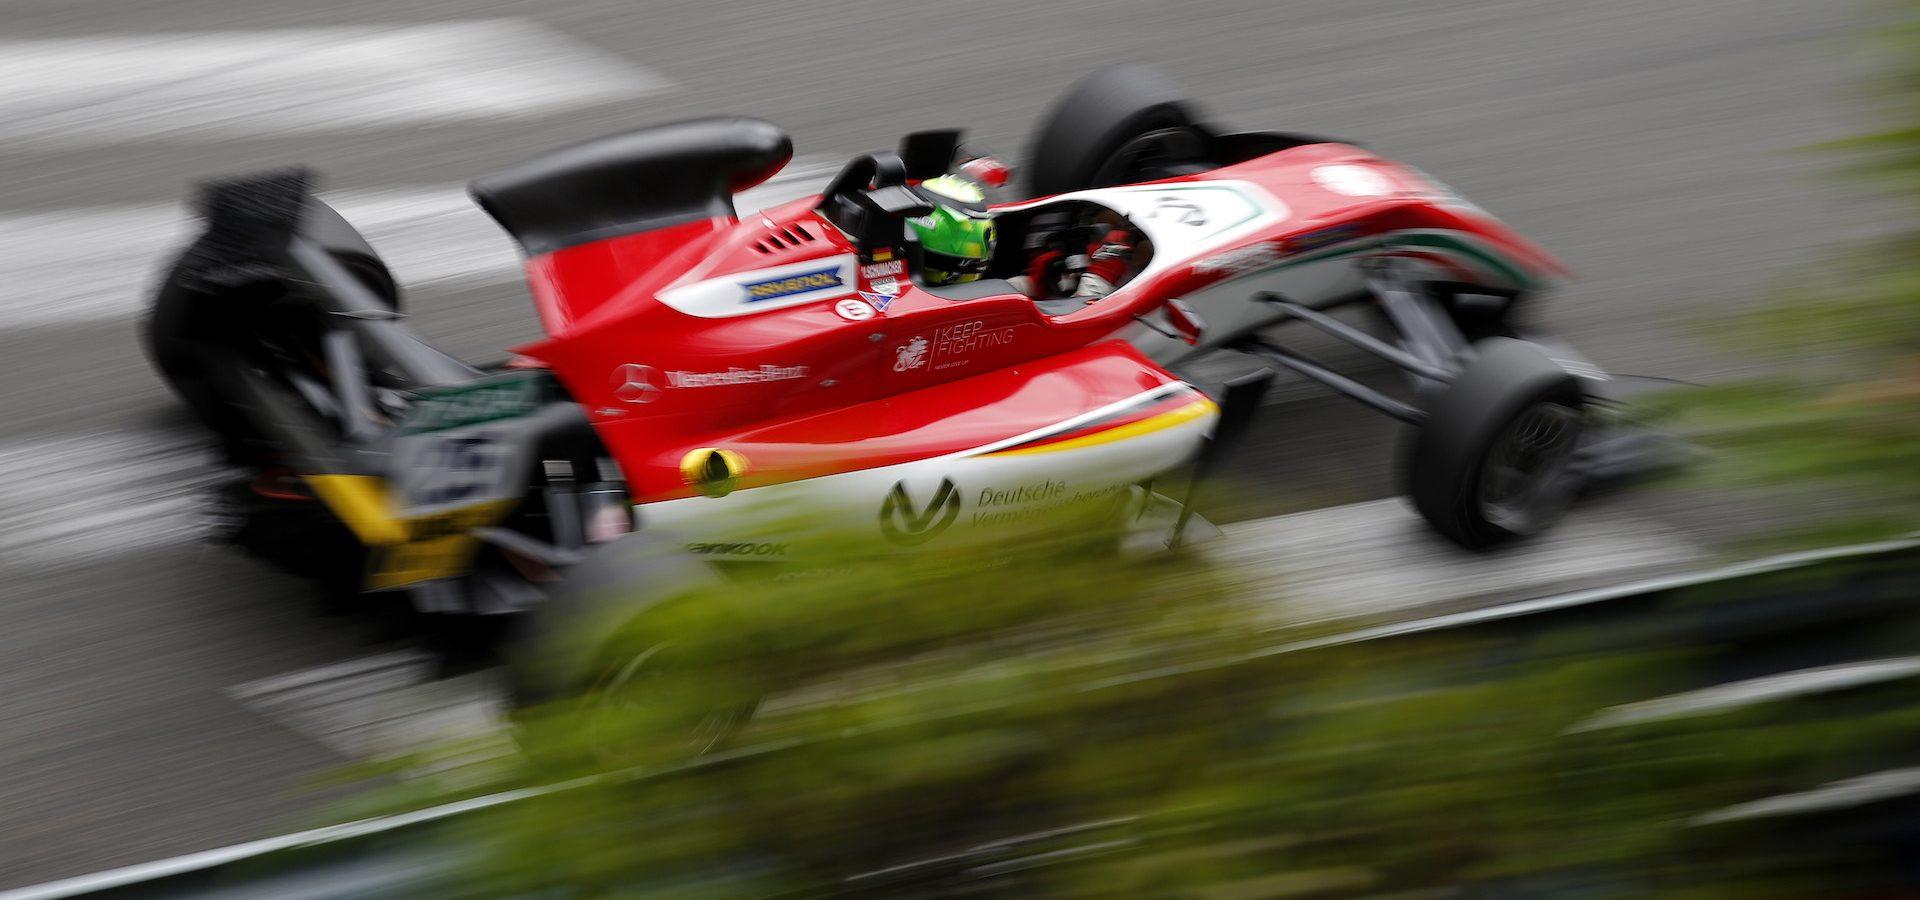 FIA Formula 3 European Championship 2017, round 3, Pau (FRA)